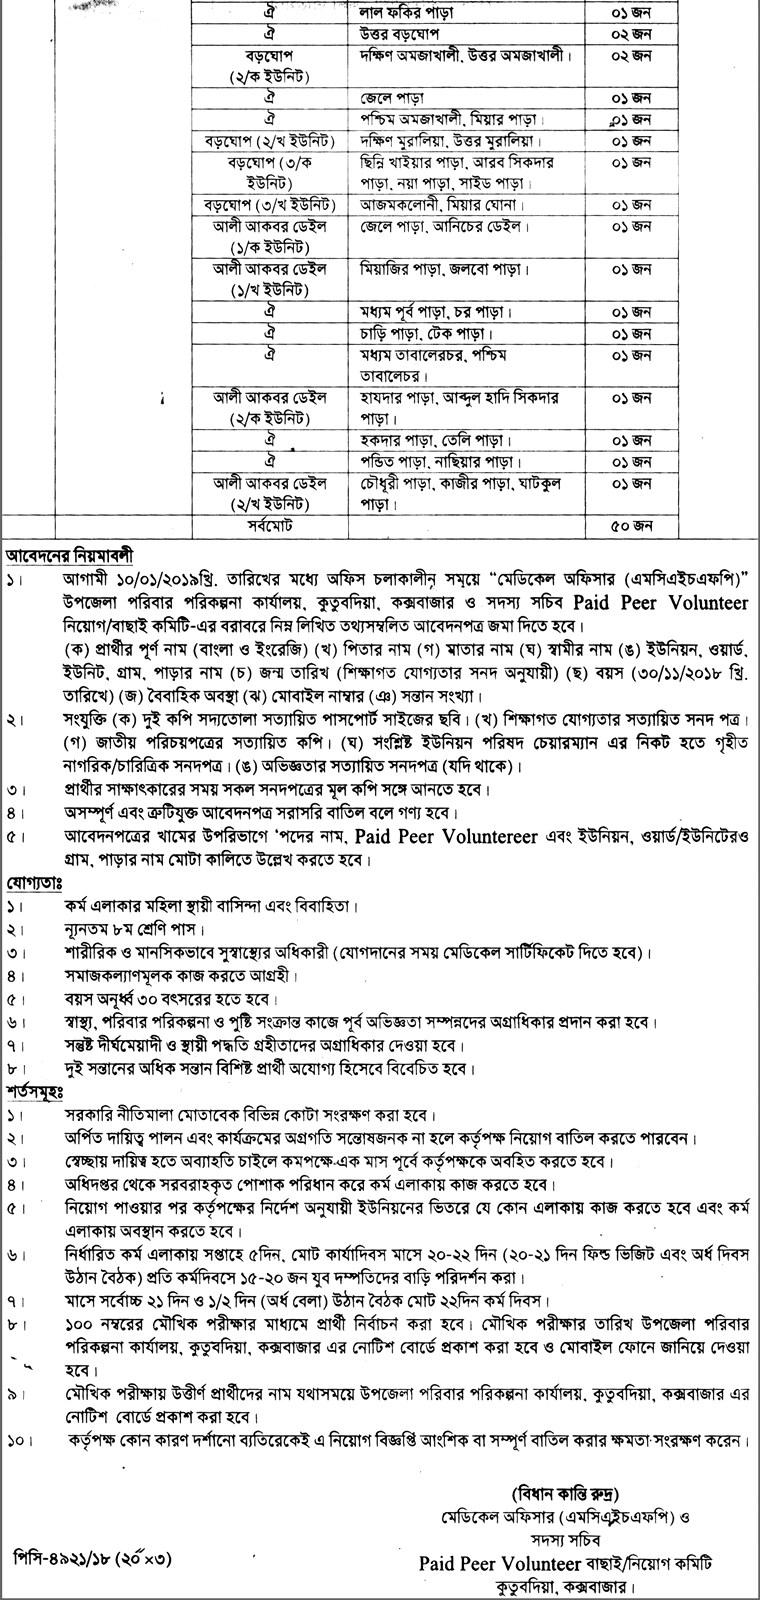 Cox's Bazar Kutubdia Upazila Family Planning Paid Peer Vulanteer (Female) Job circular 2018